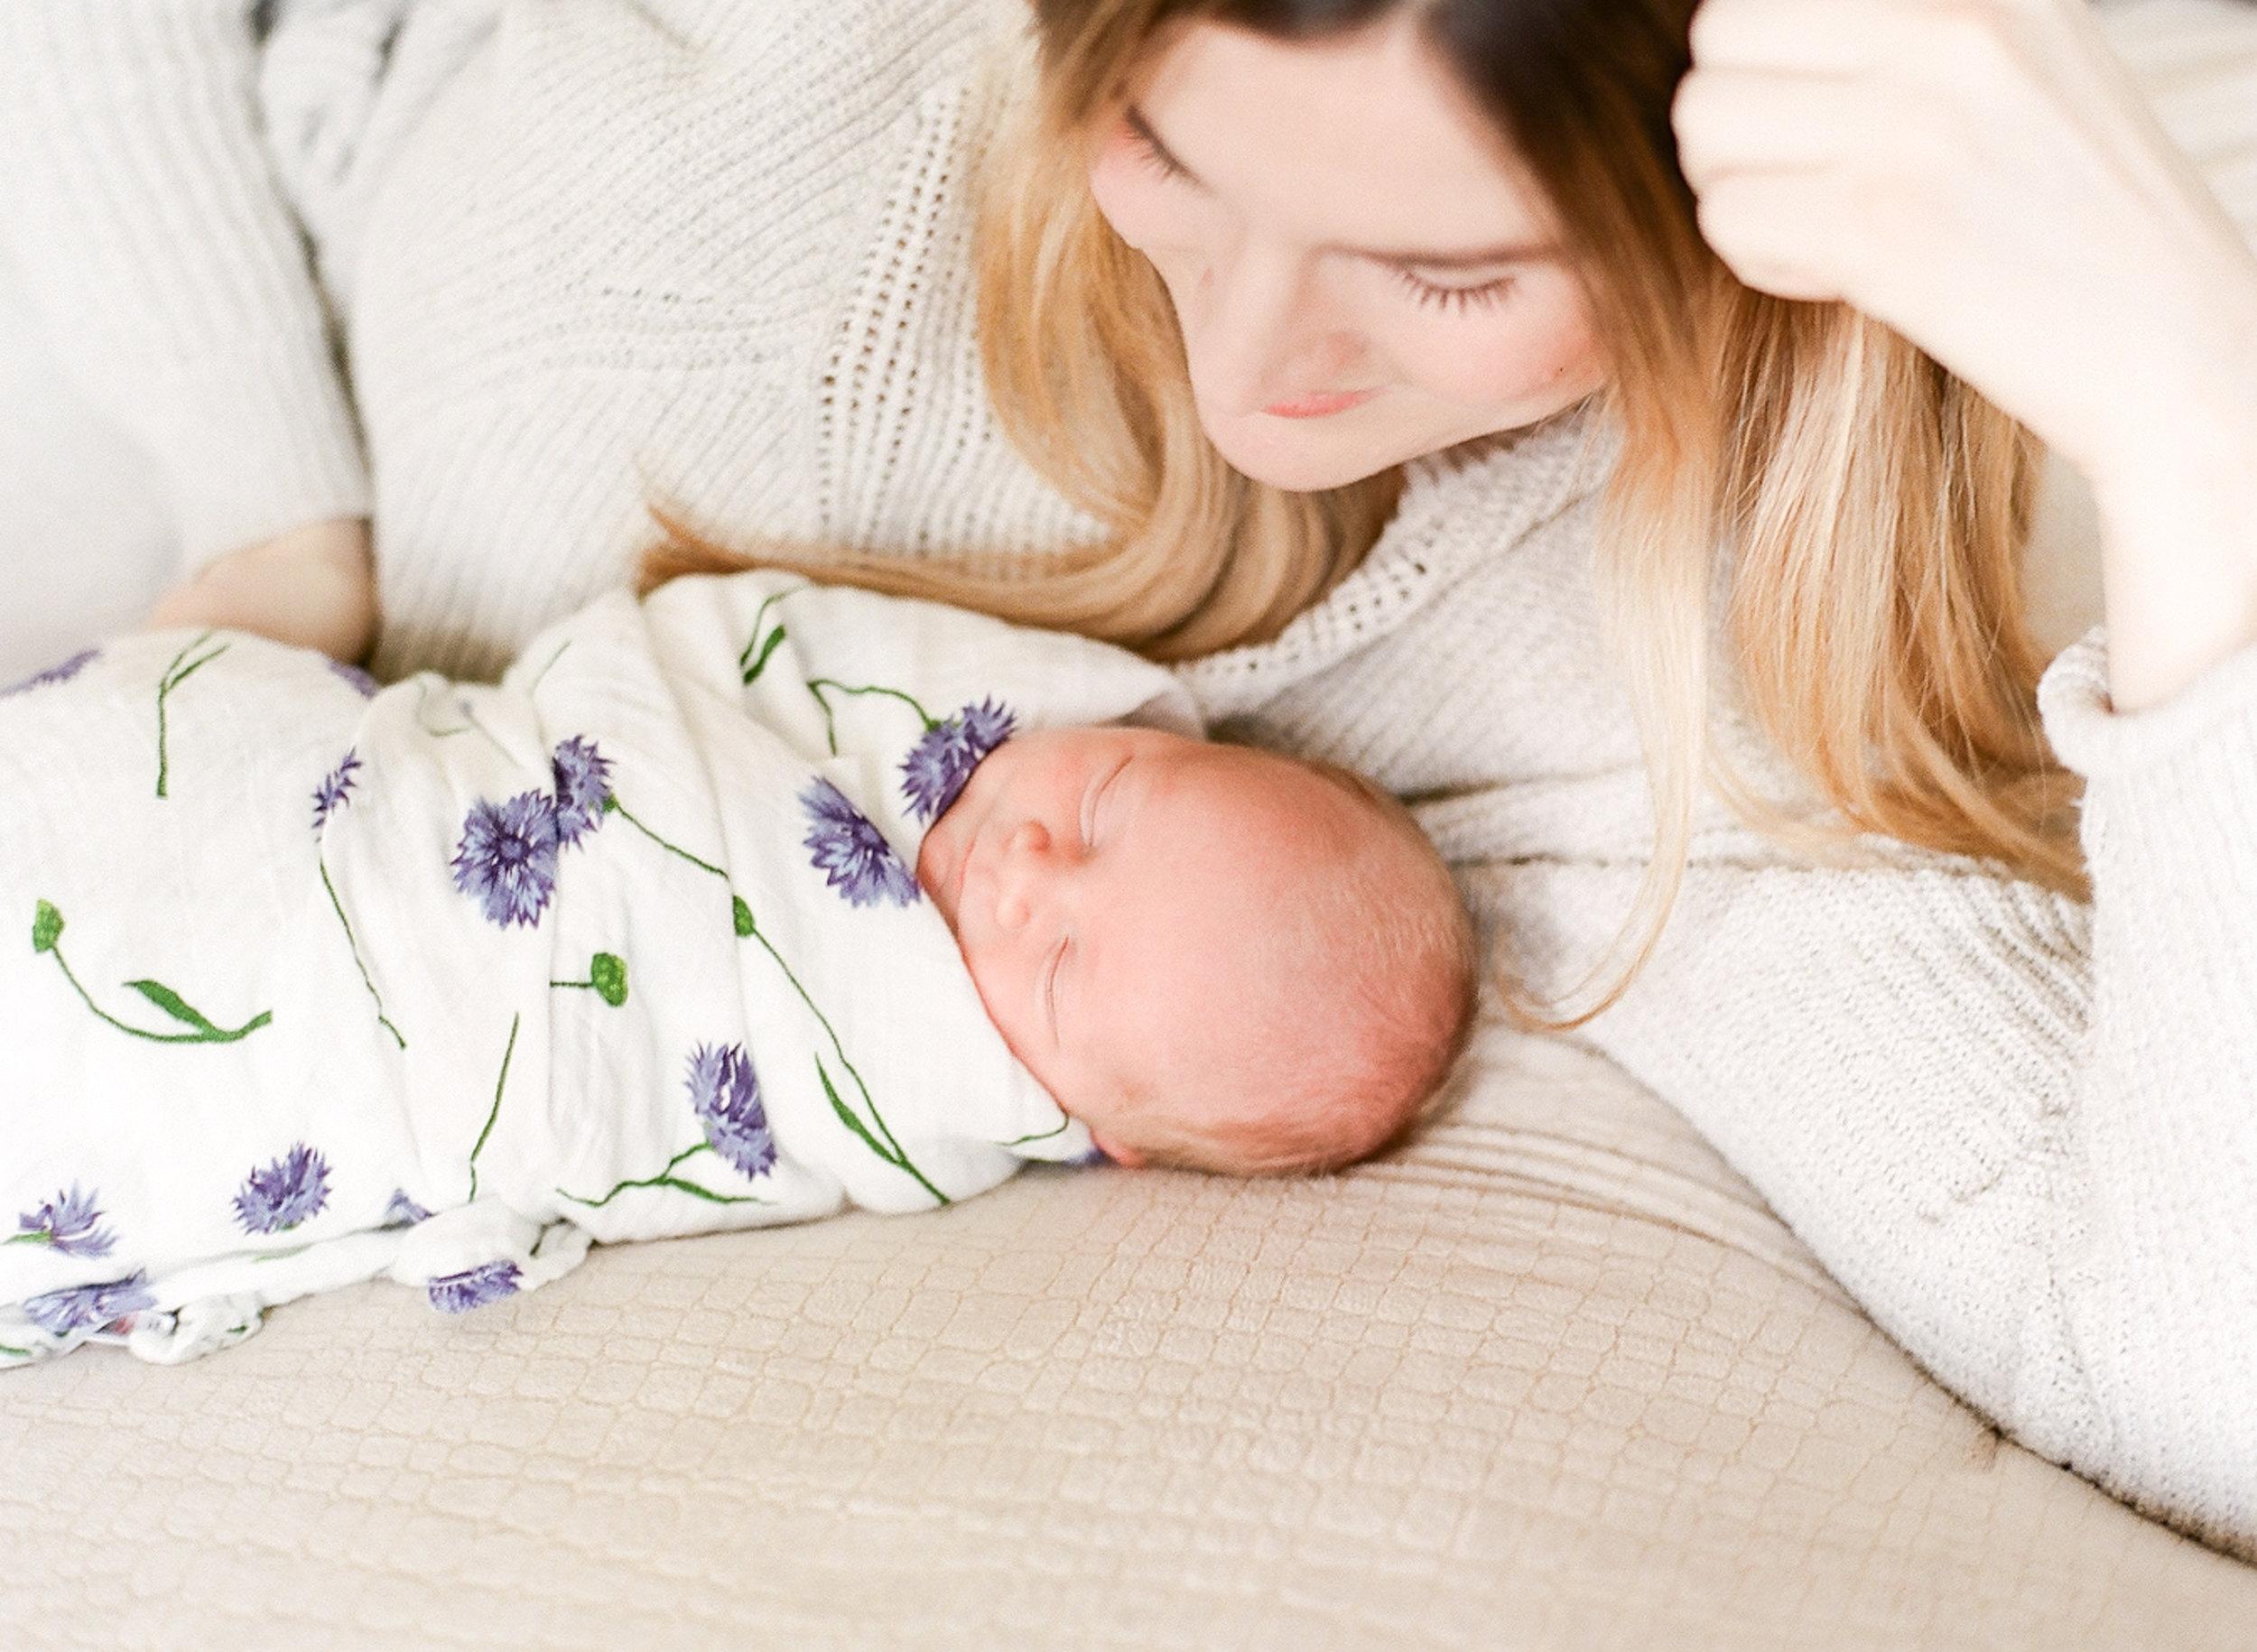 Bonphotage Newborn Fine Art Photography